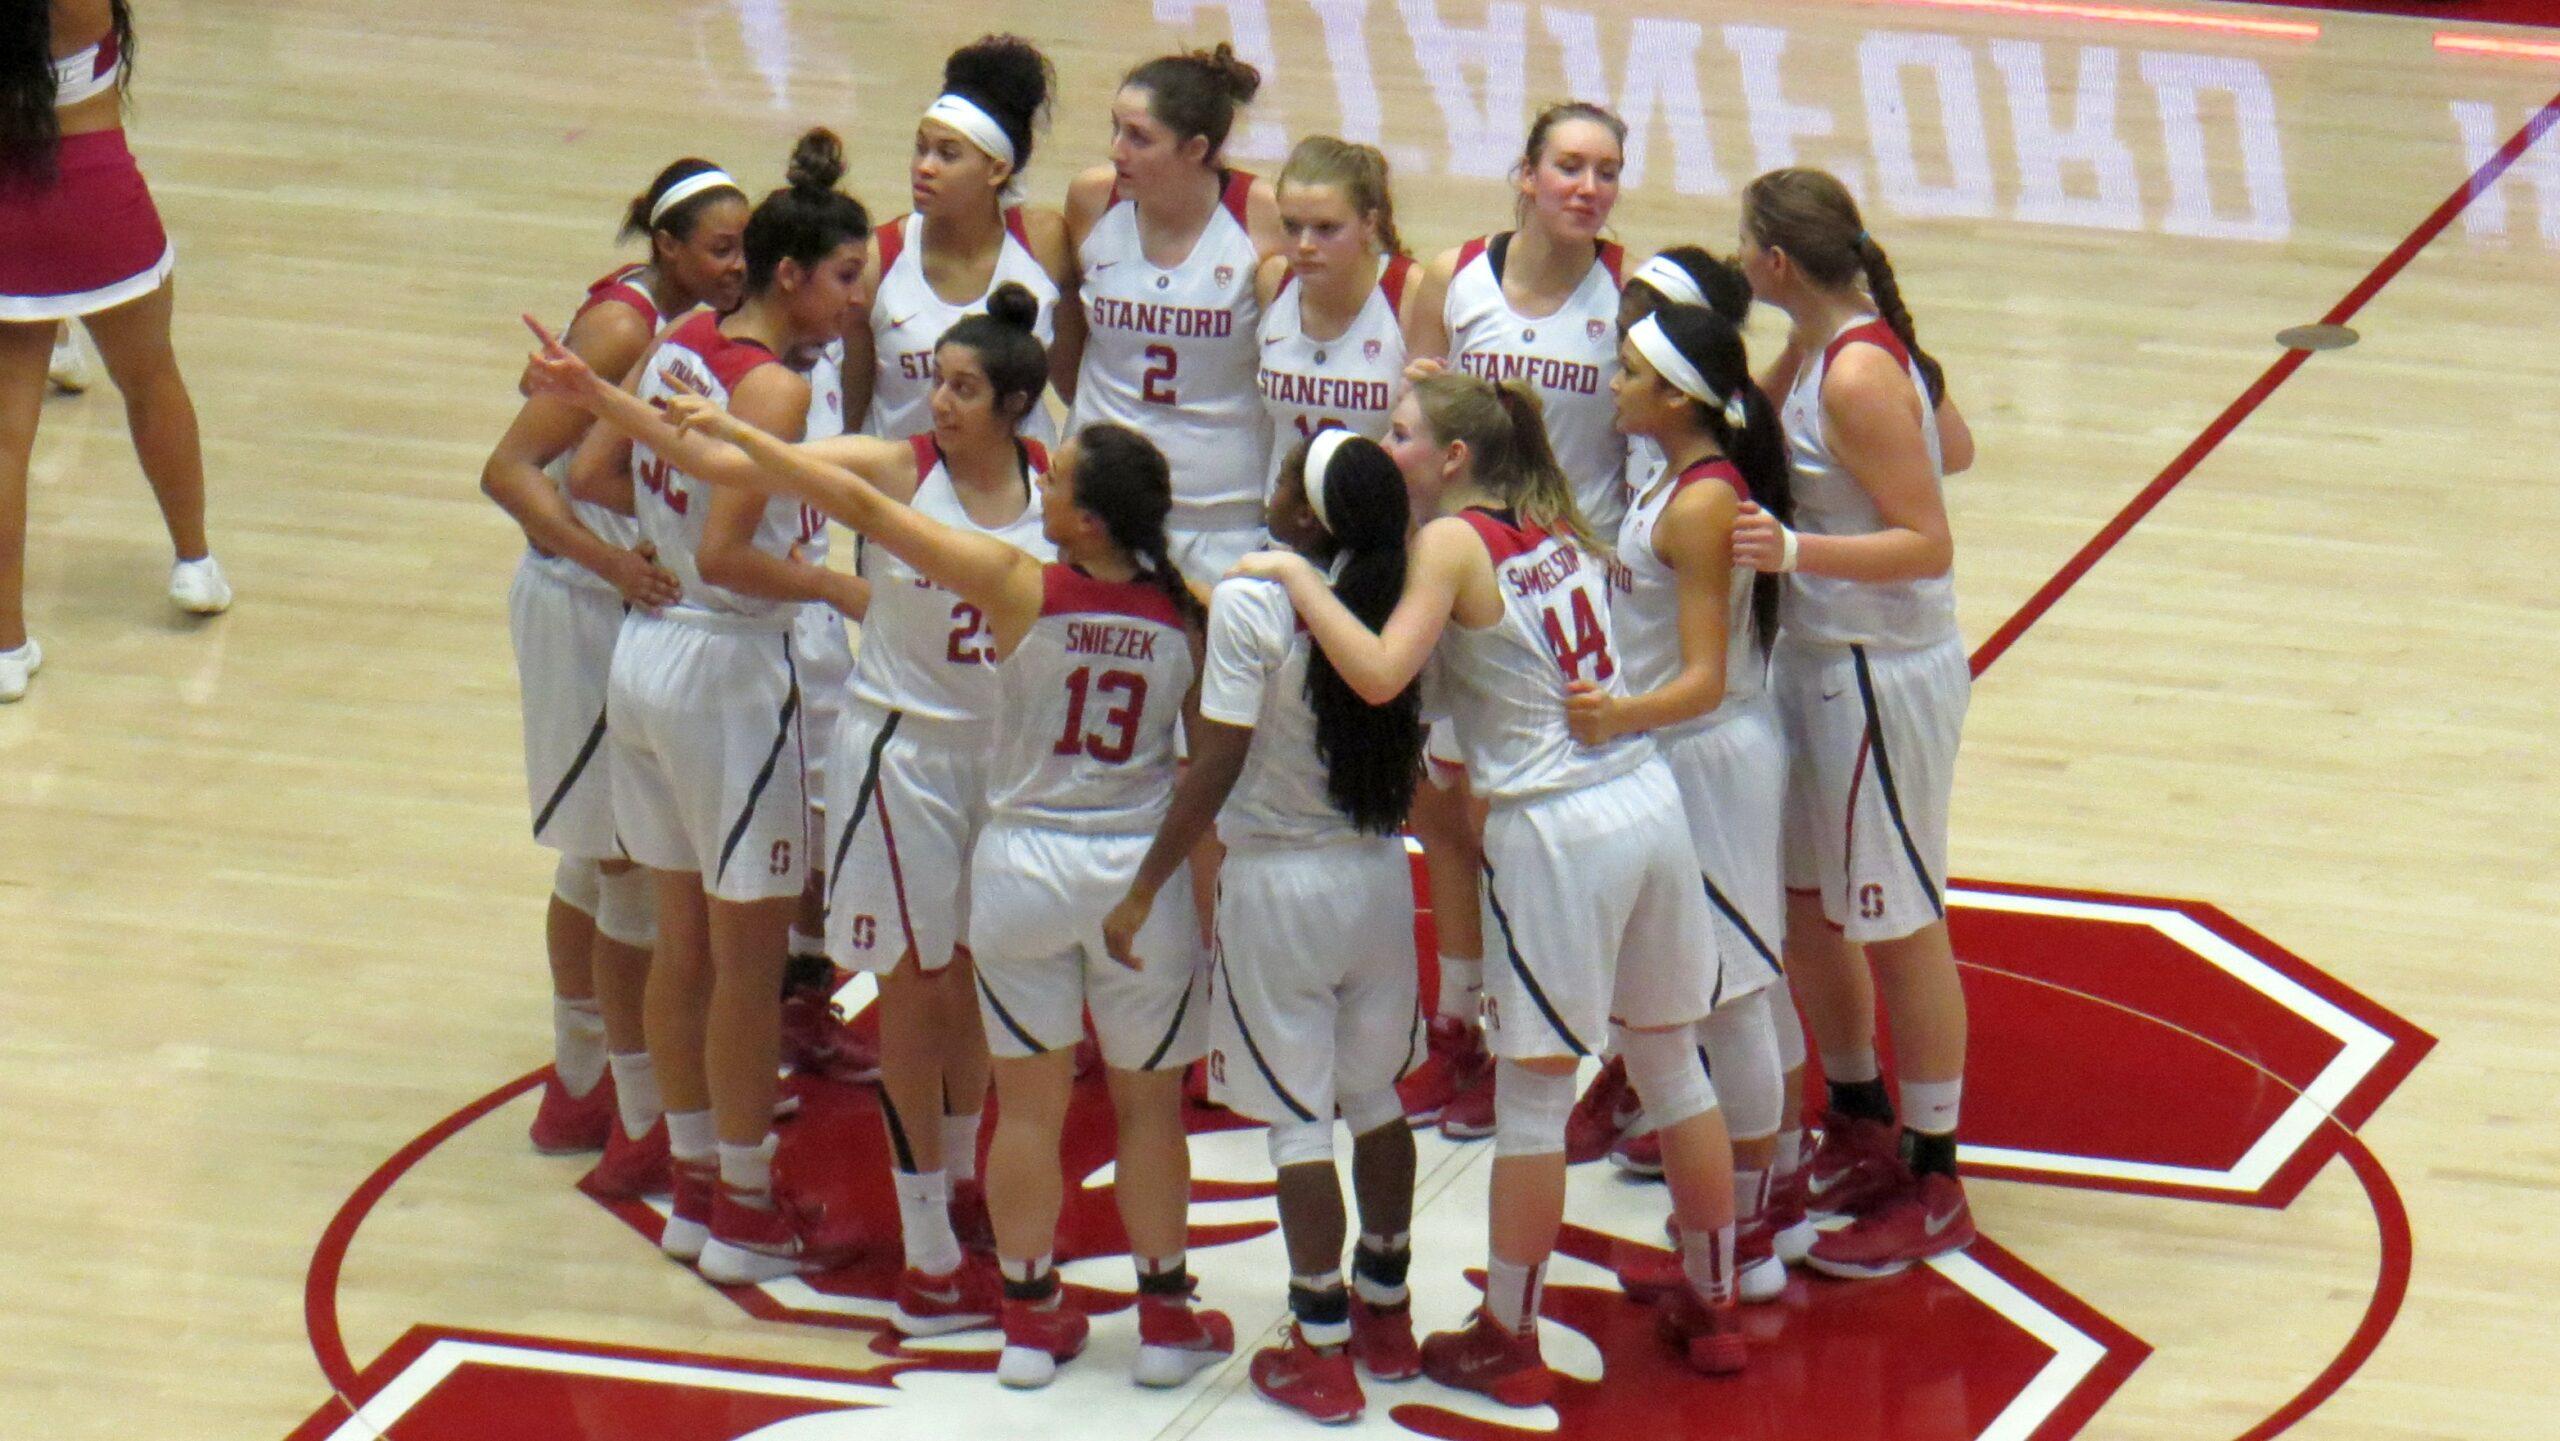 Third quarter surge helps Stanford put away up-and-coming Utah, 72-52